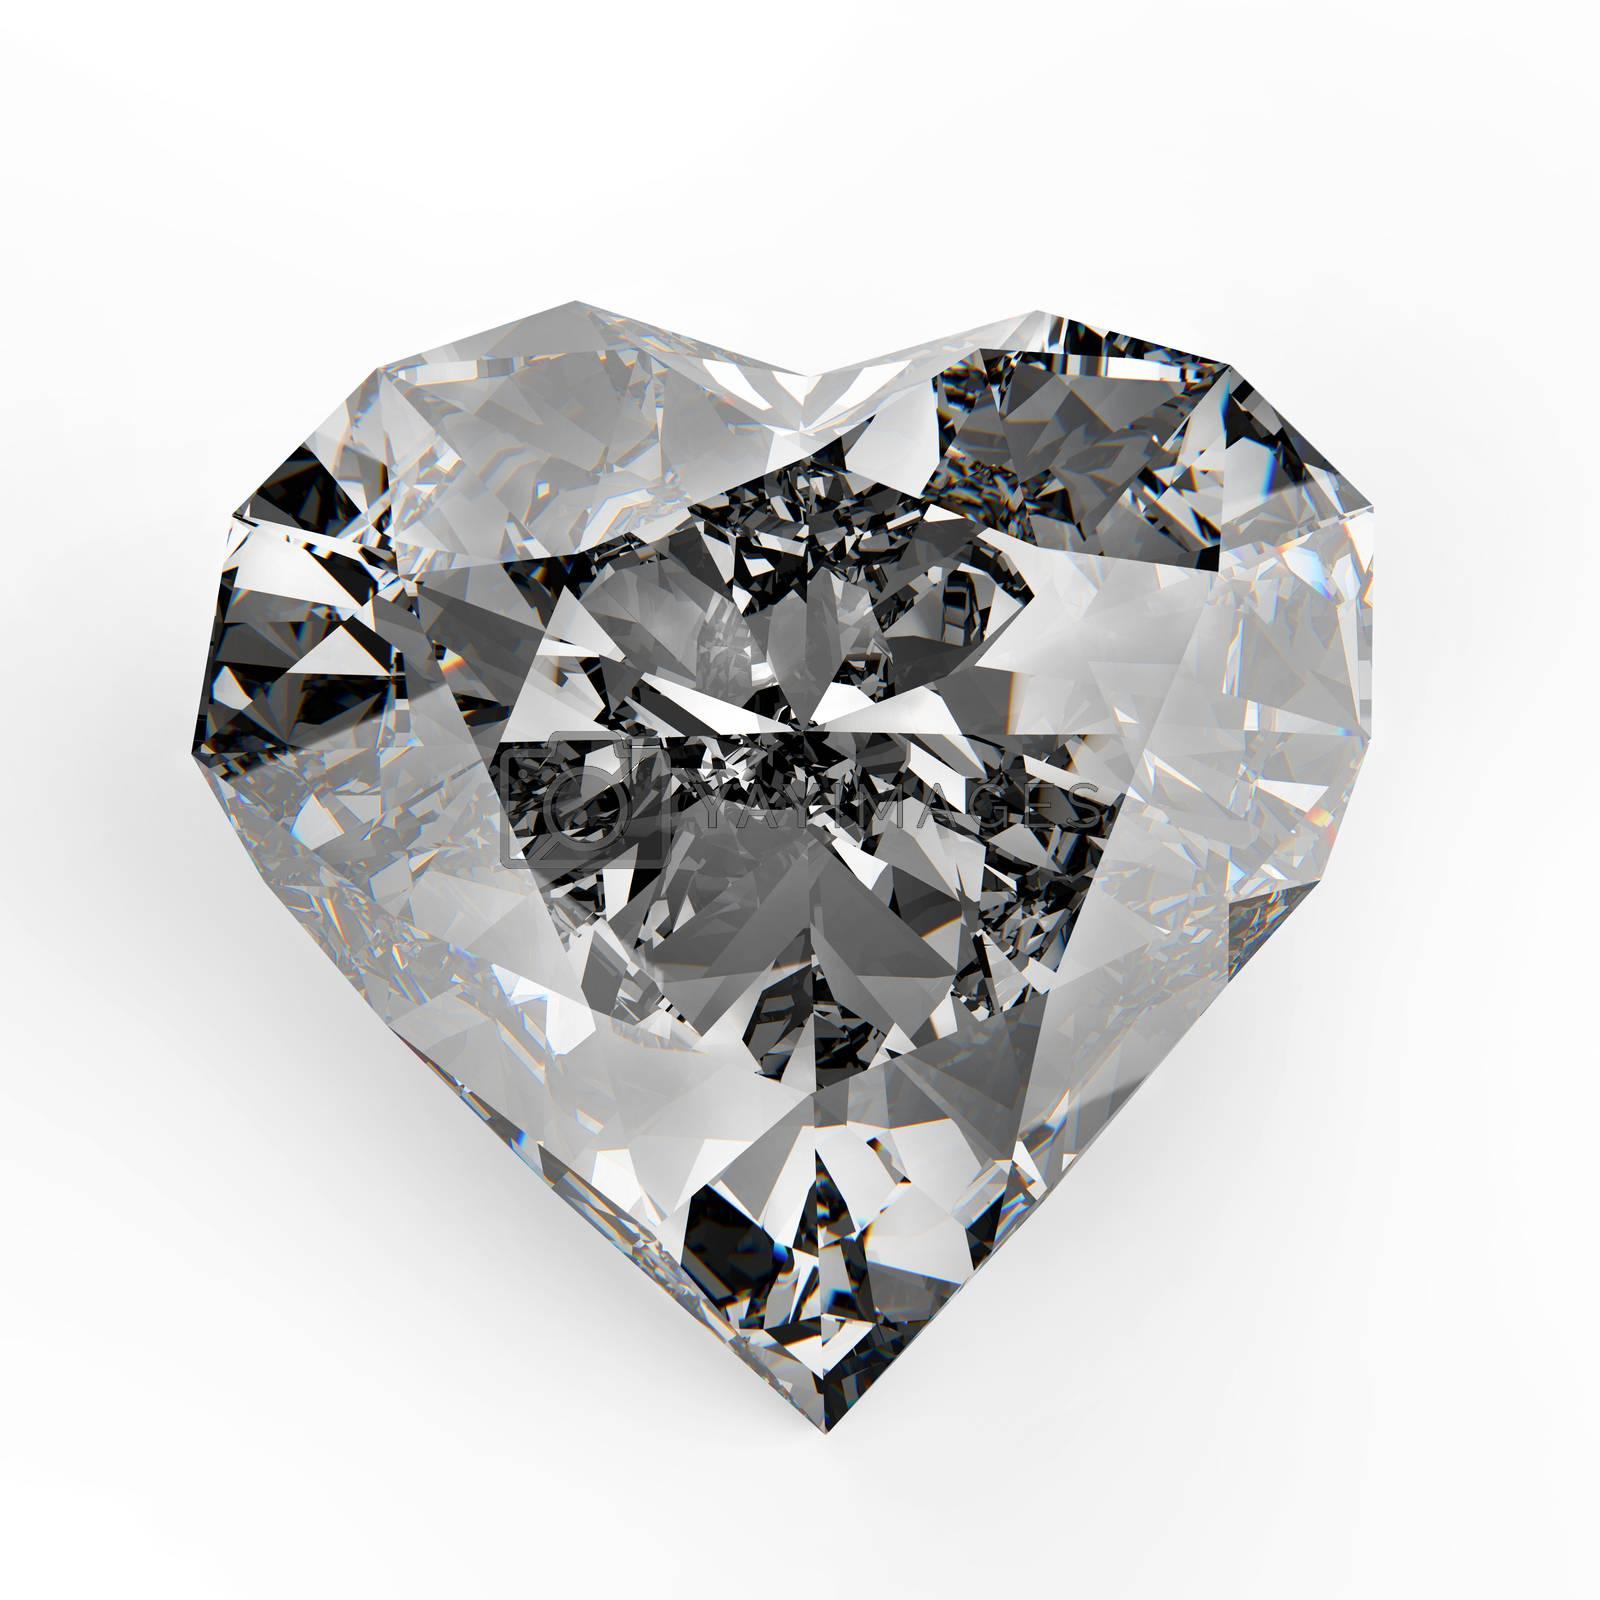 3d diamond heart shape on white background